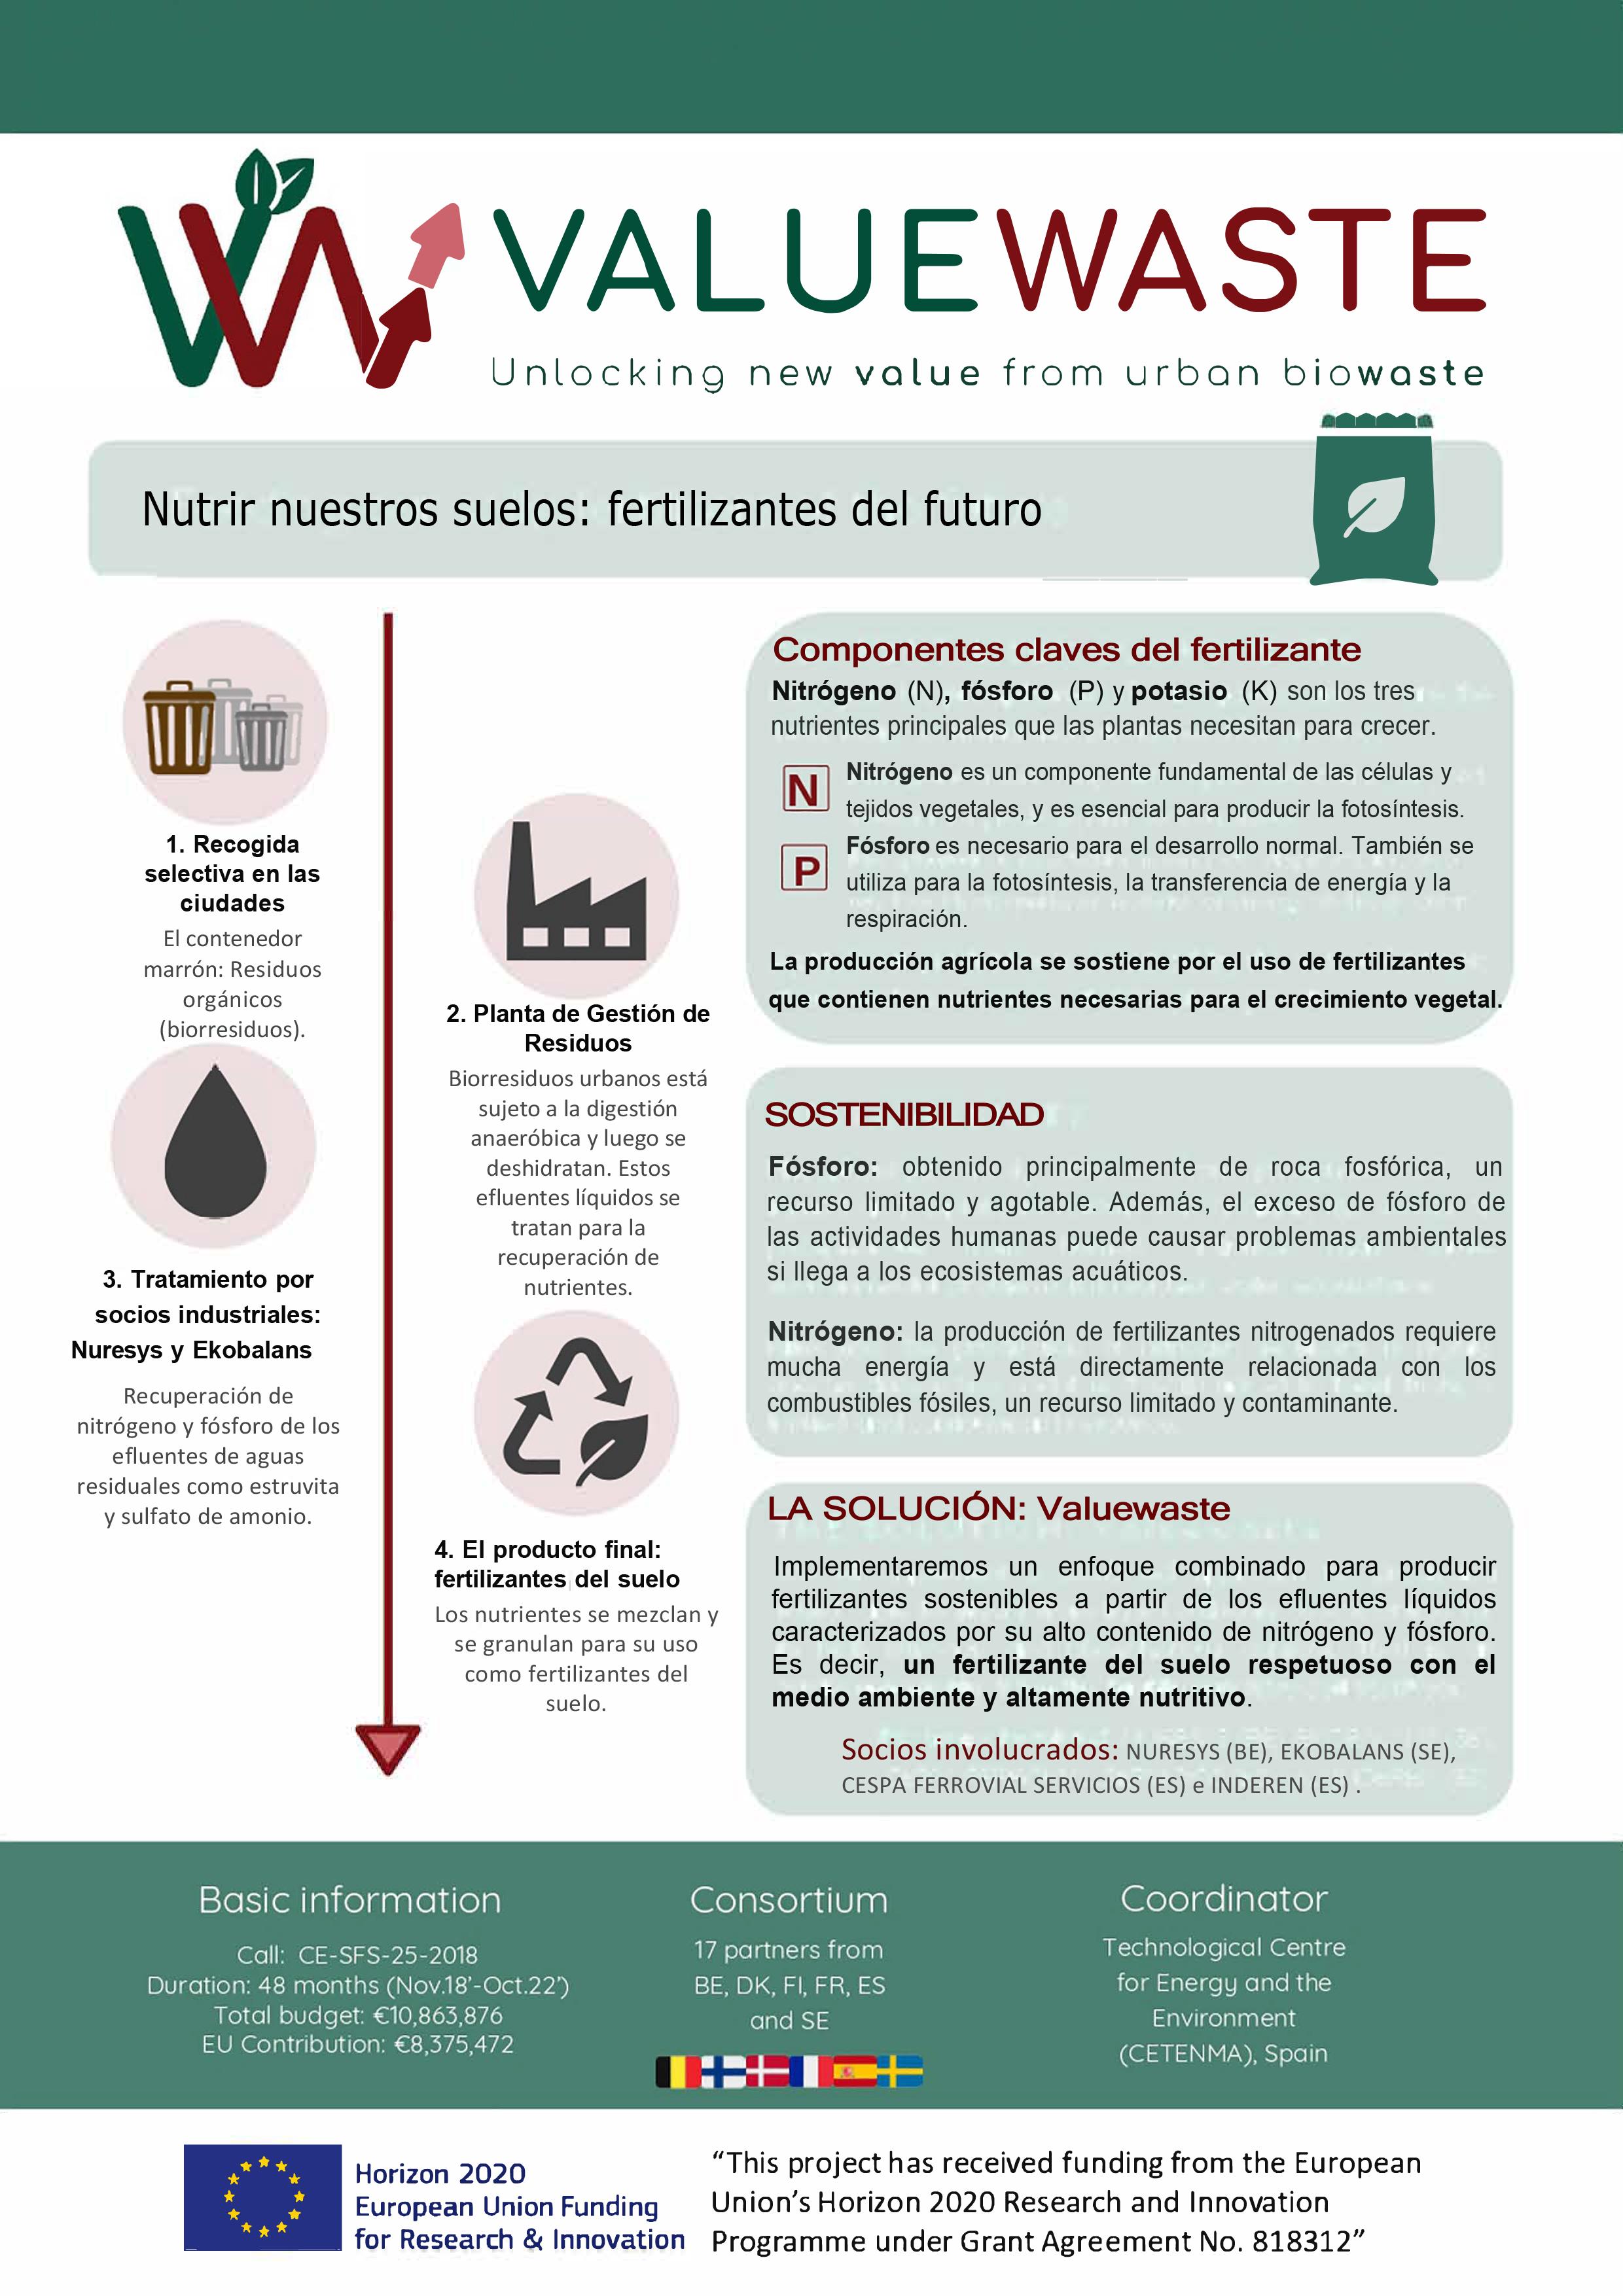 ValueWaste proyecto fertilizantes futuro ValueWaste-Part2-fertiliser-ESP